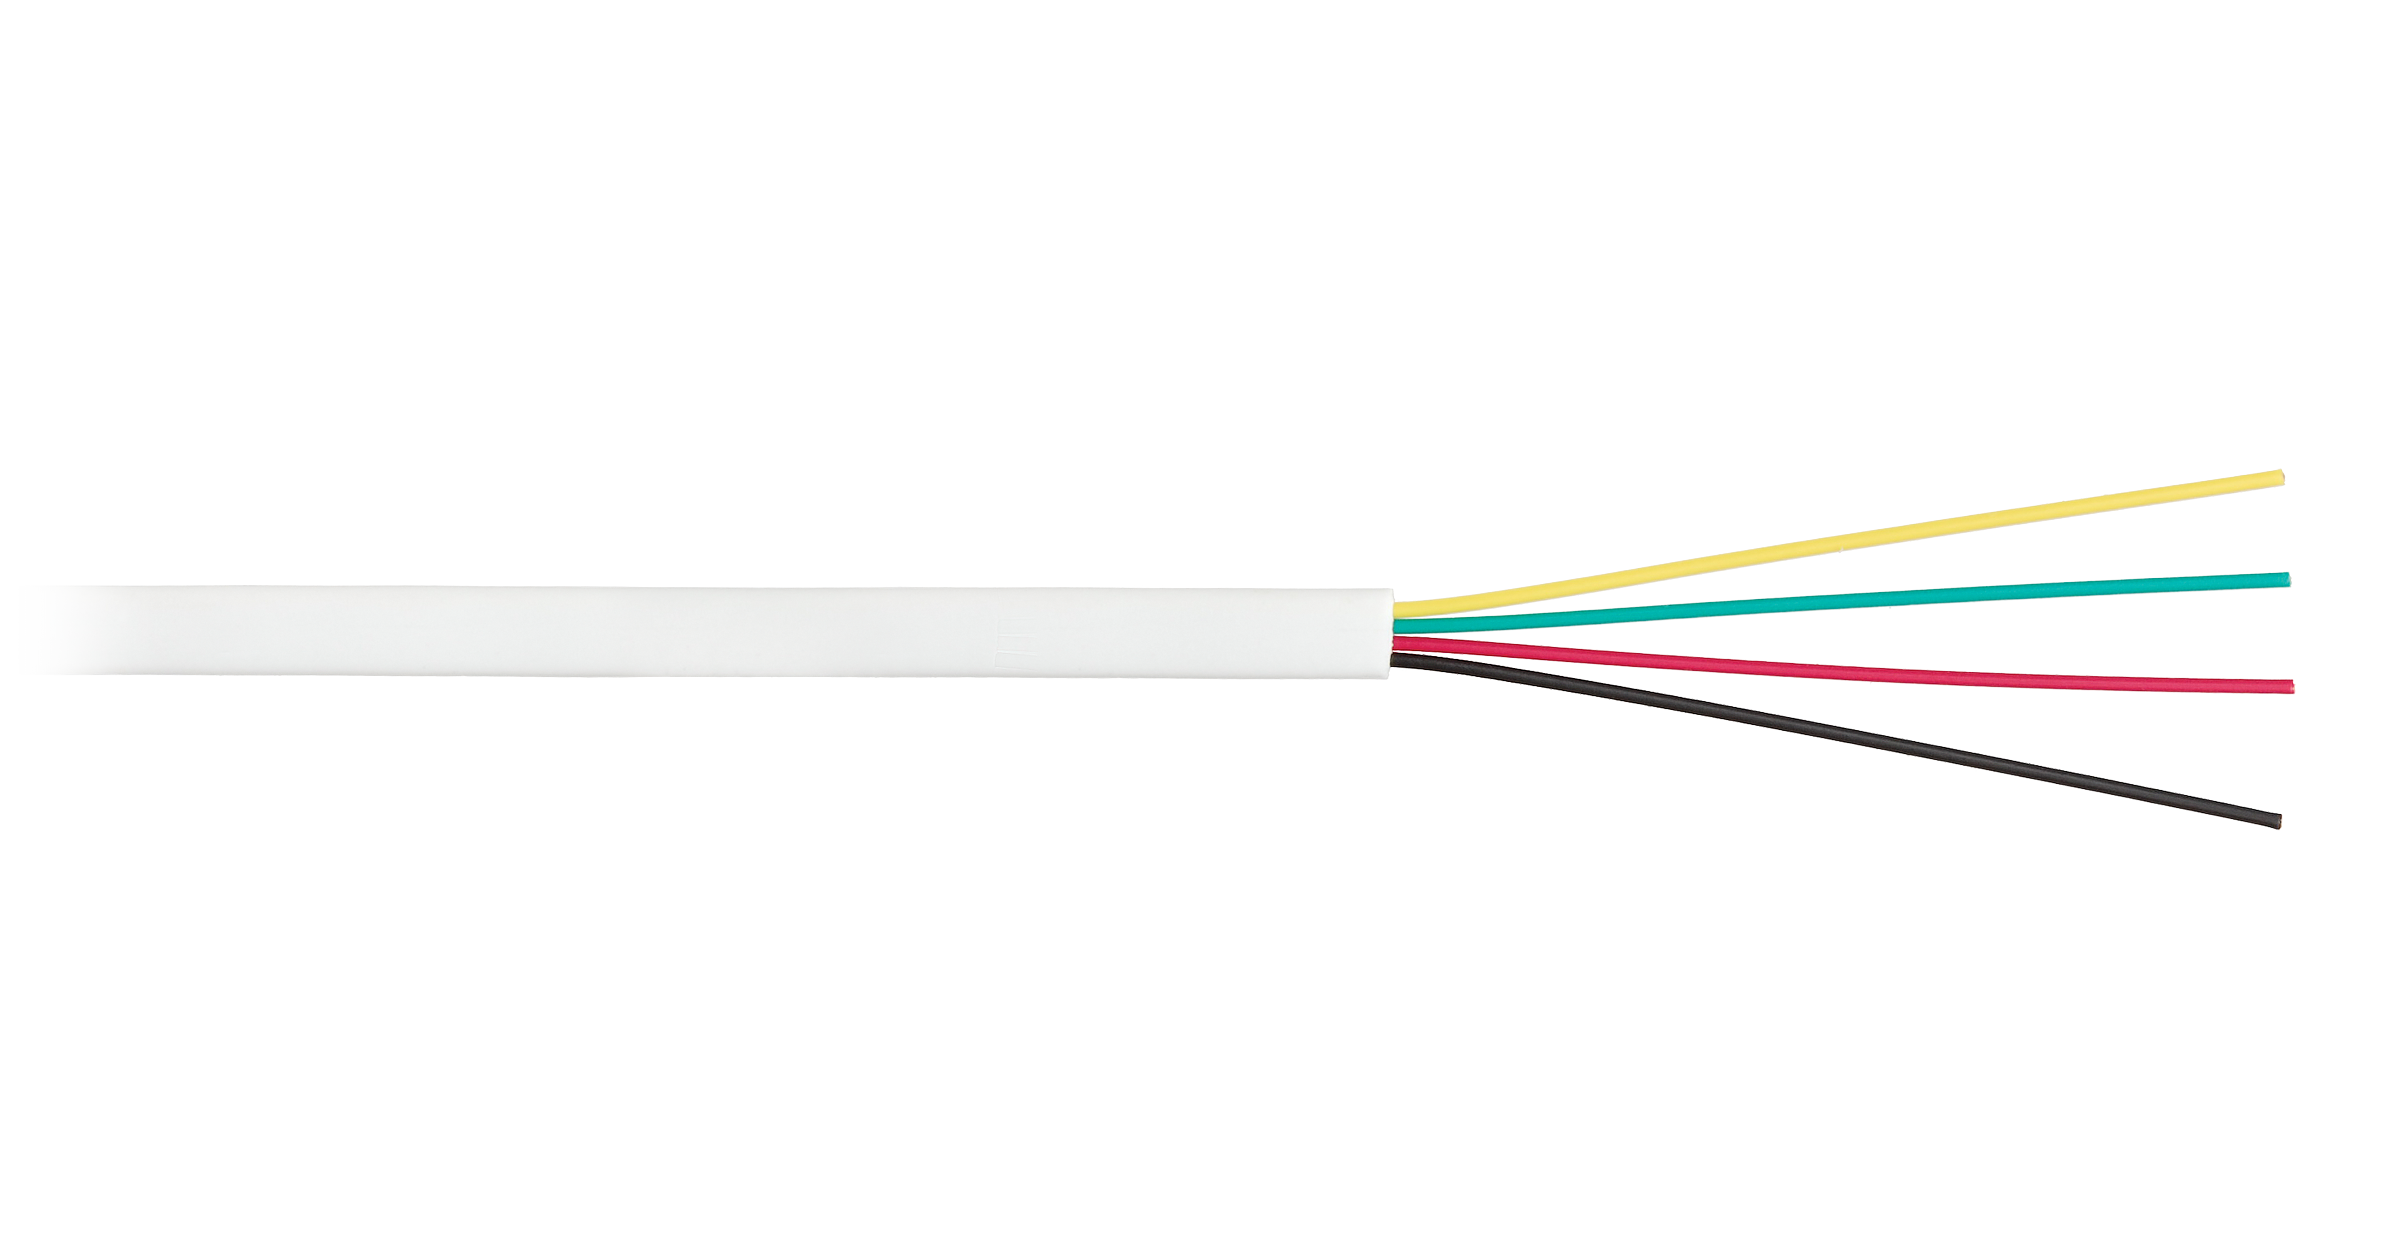 NKL 2026A-WT Кабель NIKOLAN телефонный, плоский, 4 многожильных проводника, BC (чистая медь), 26AWG (7х0,16мм), внутренний, PVC, белый, 100м